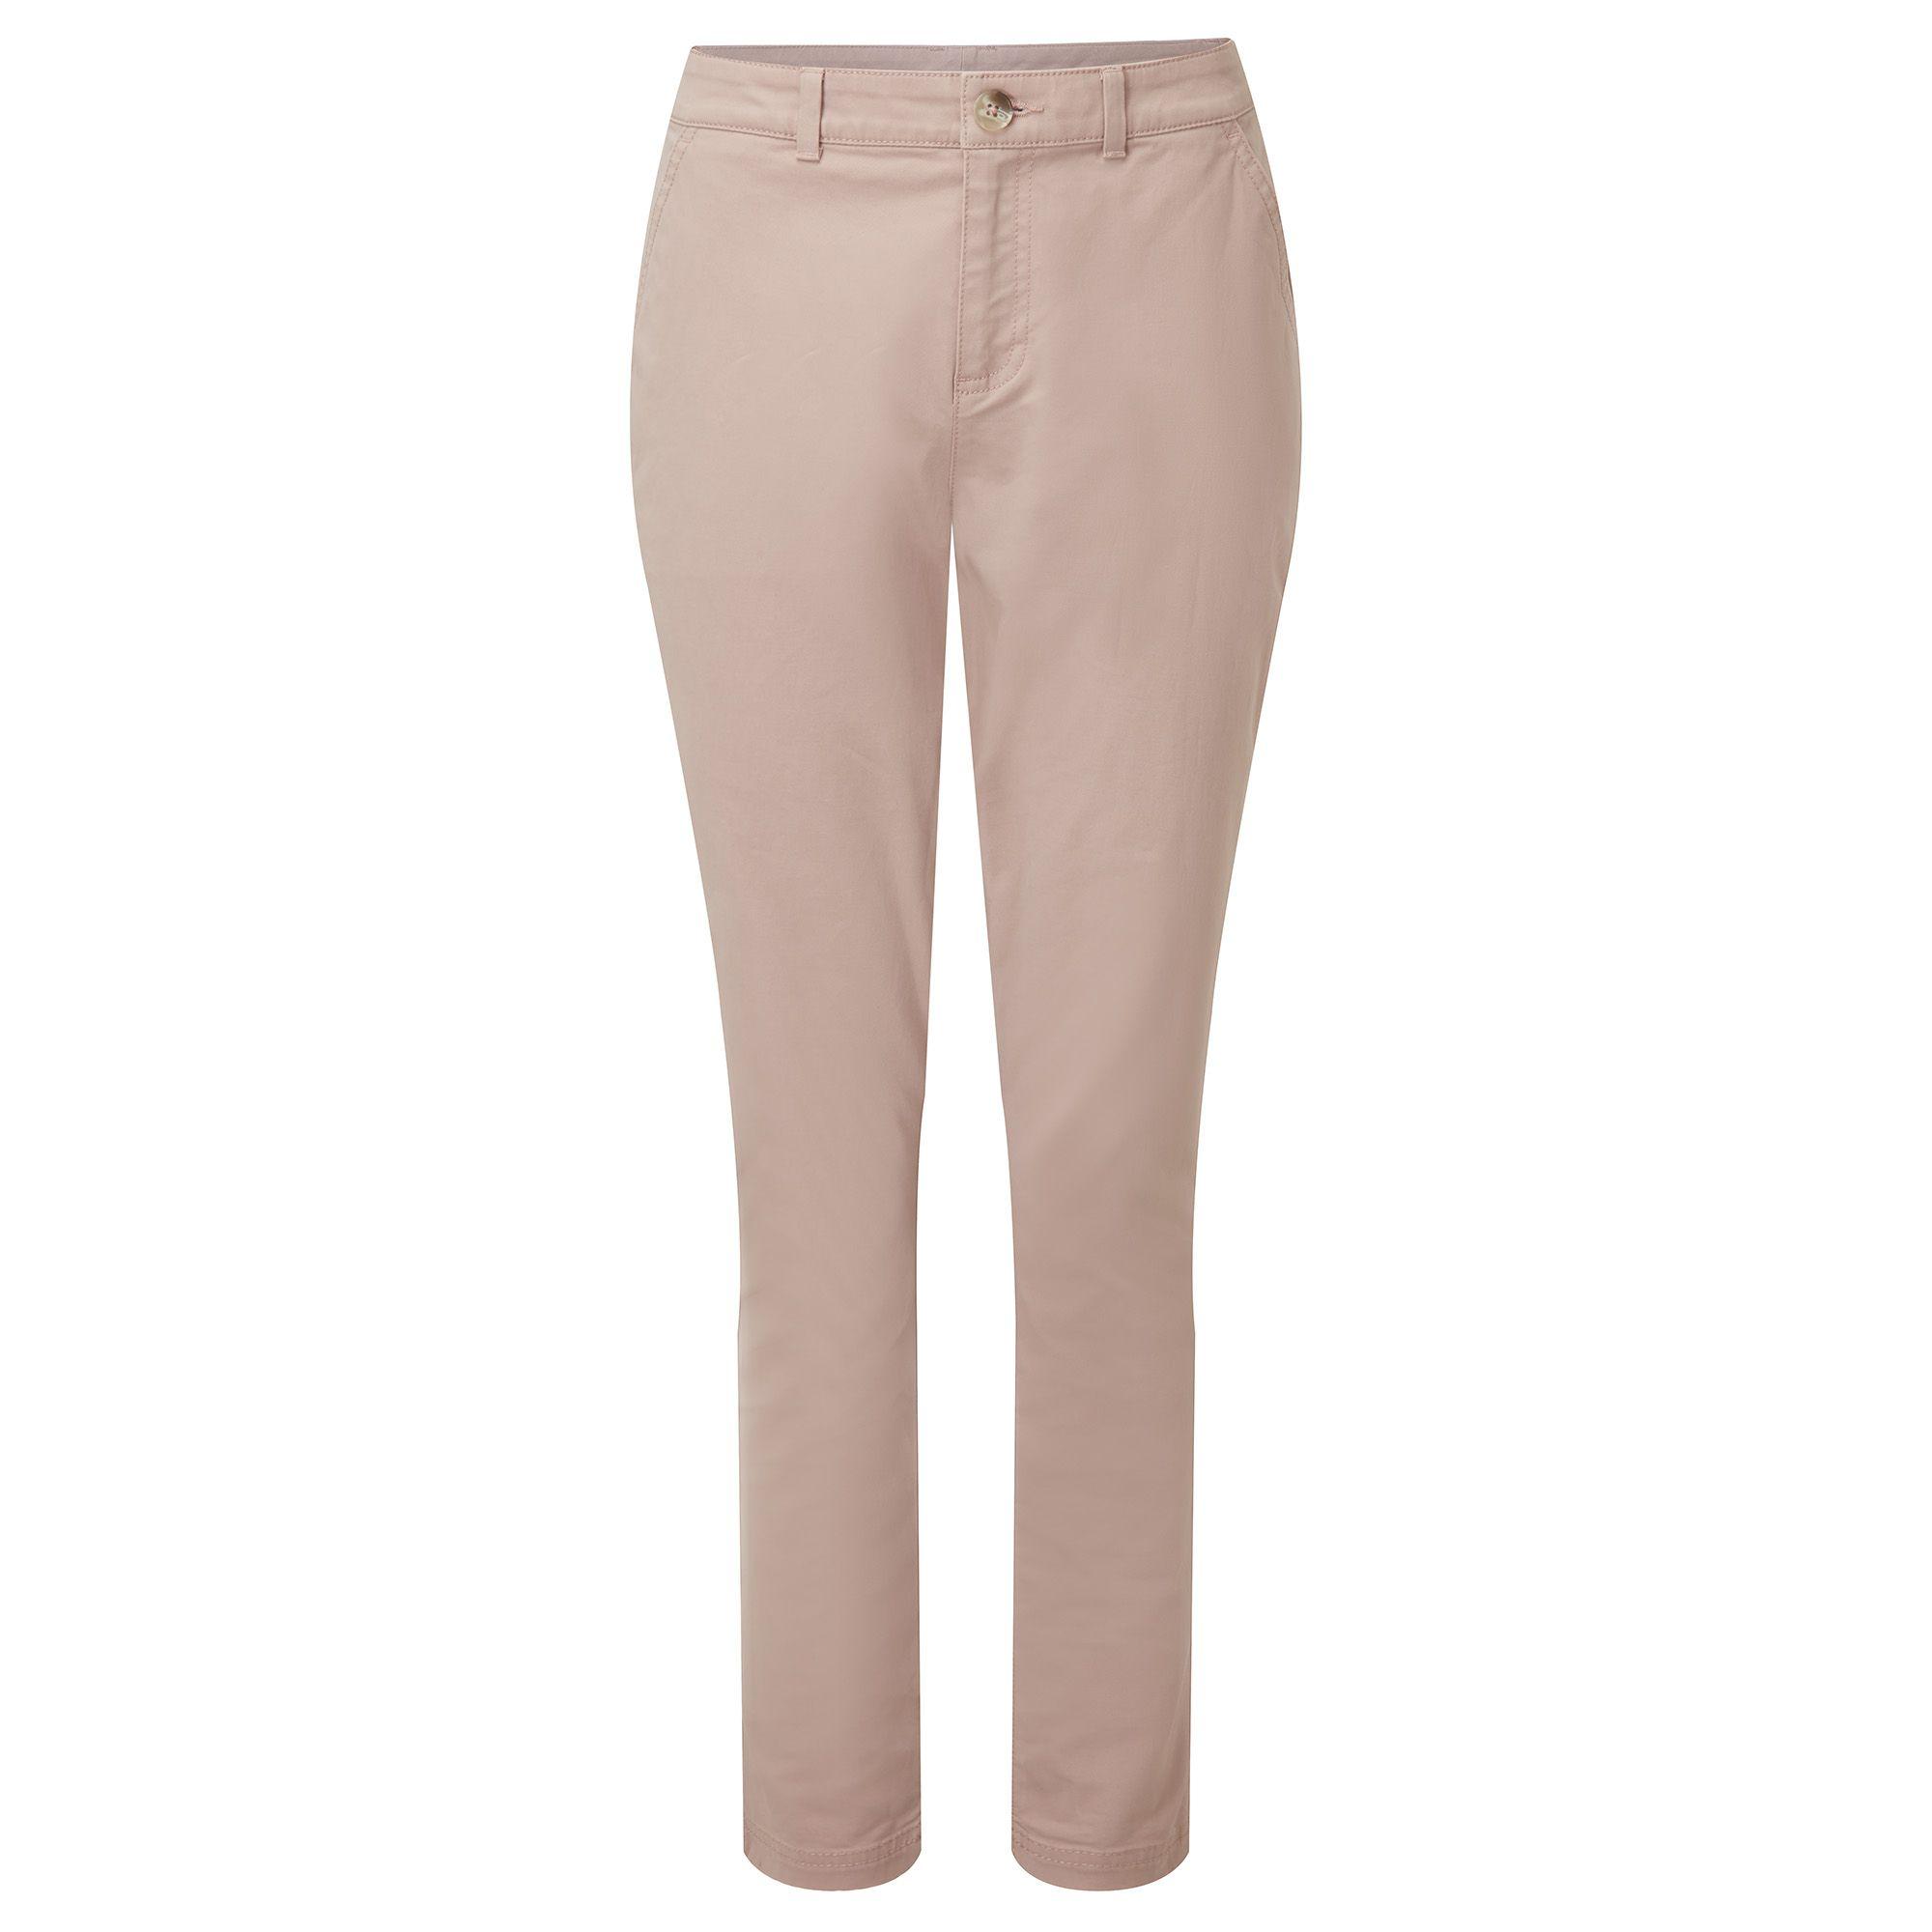 Pickering Womens Trousers Dusky Pink